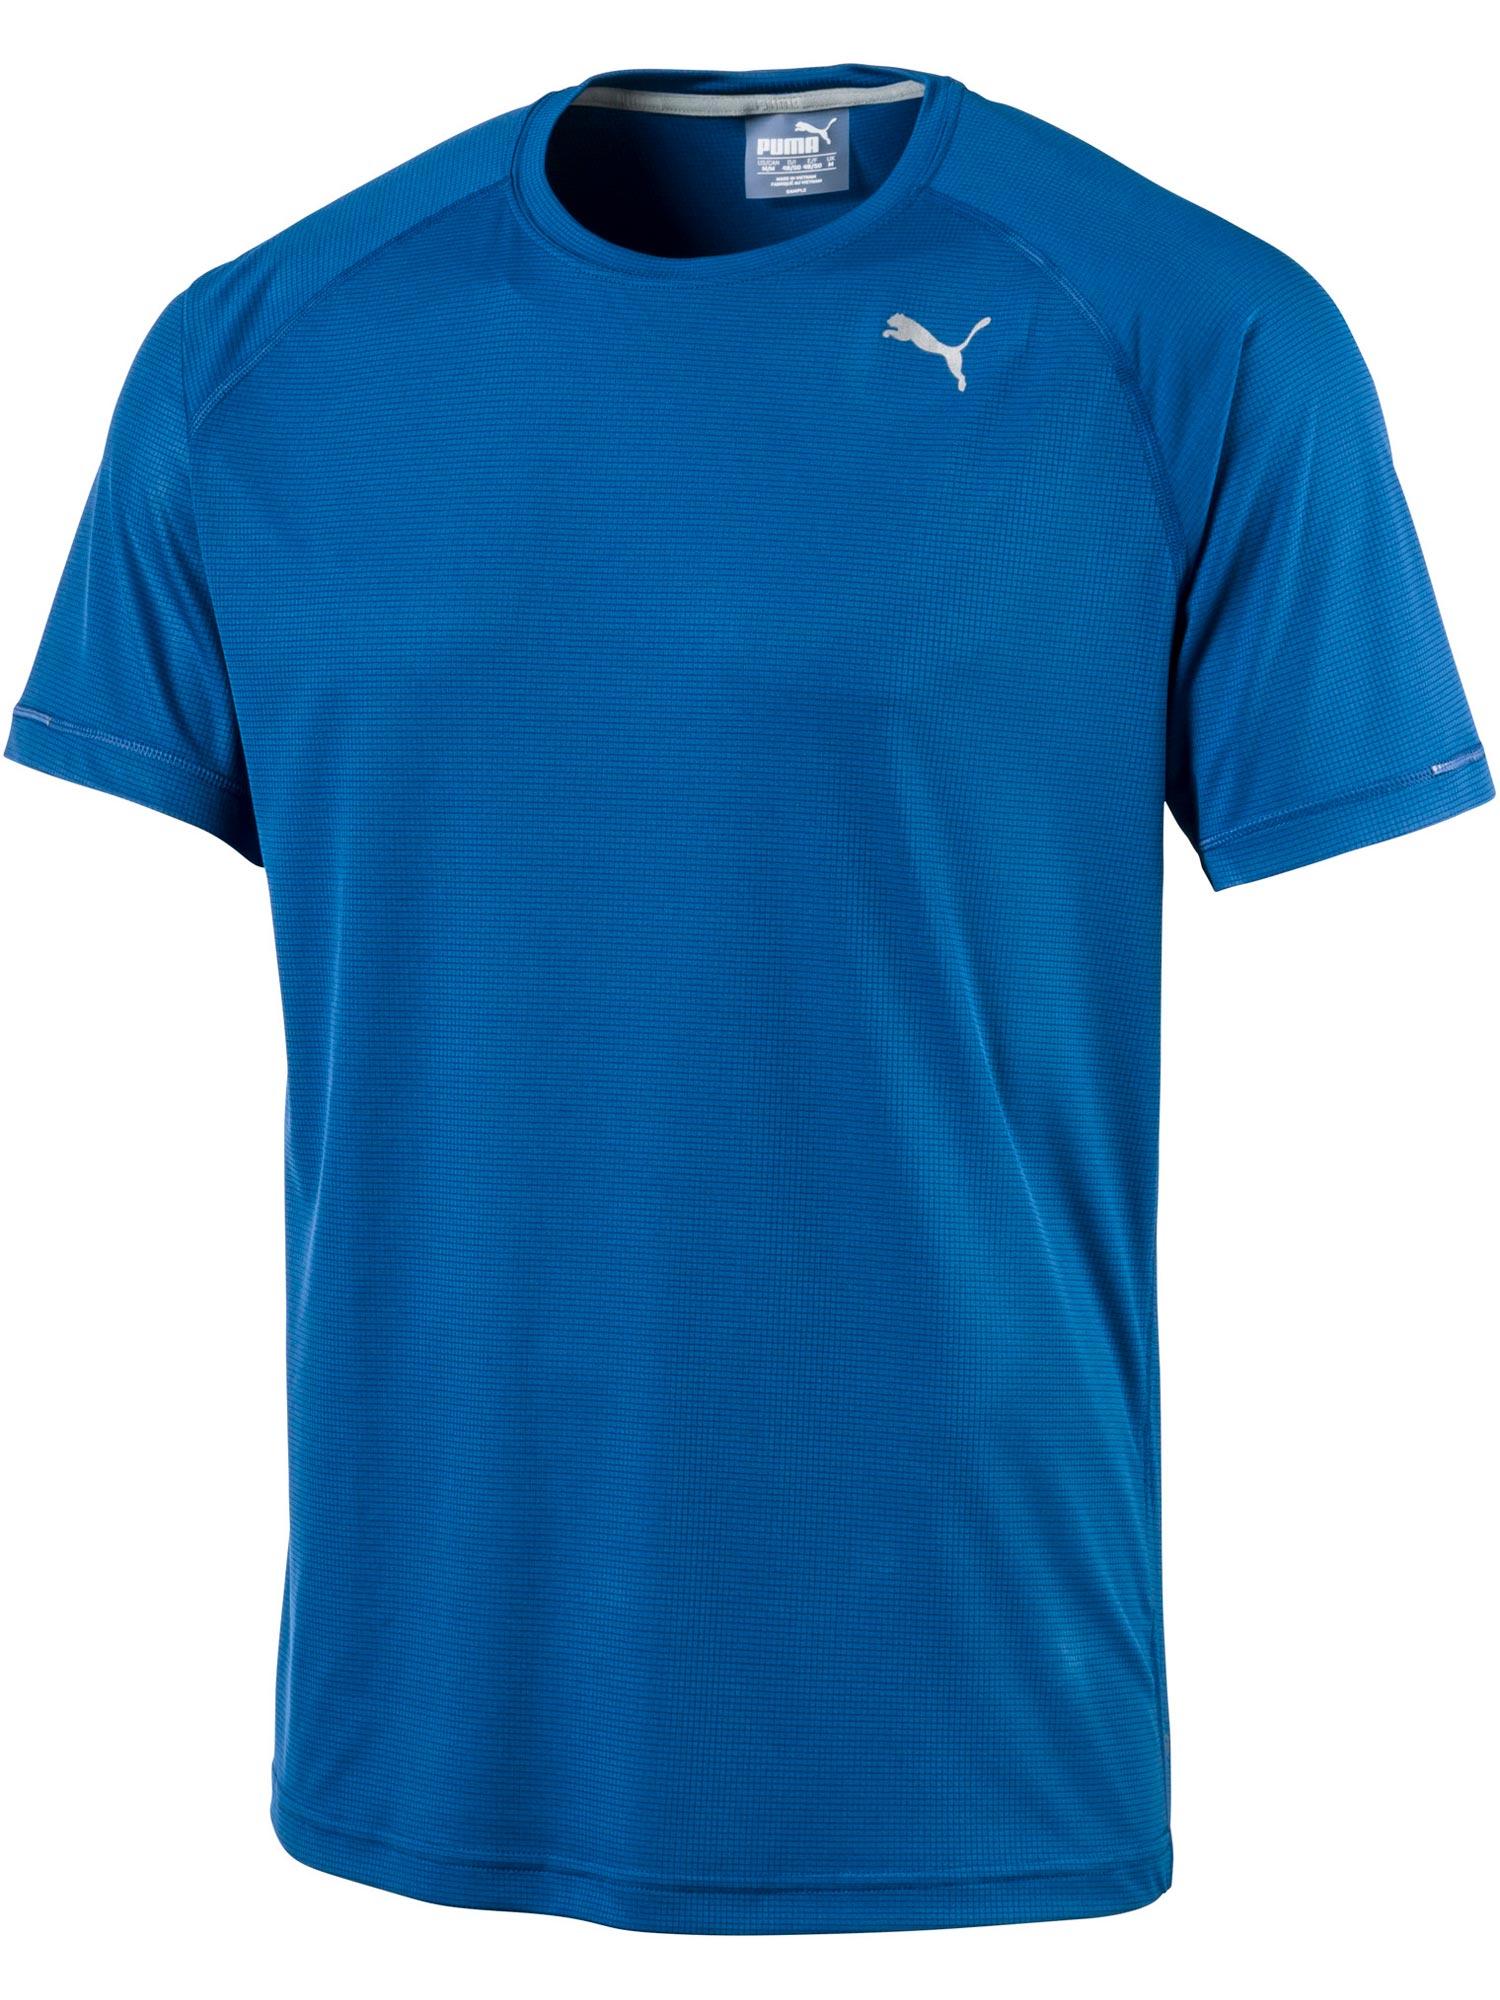 Core-Run S S Tee Lapis Blue